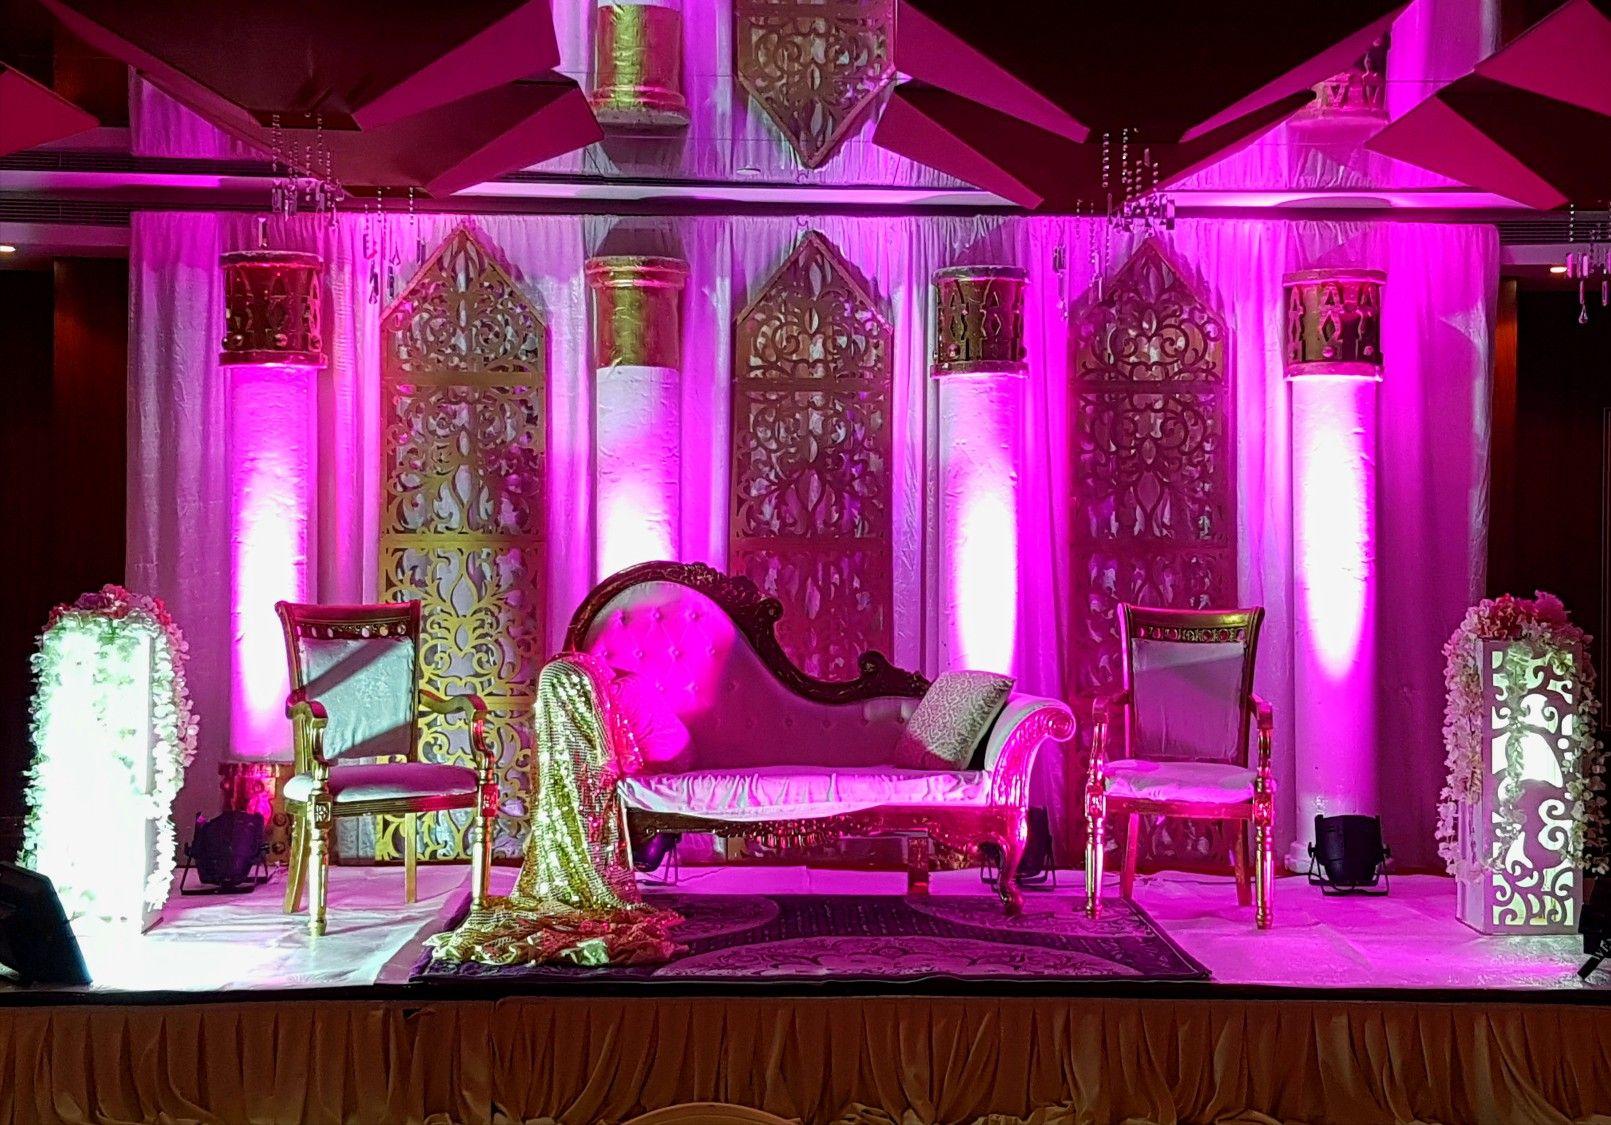 Simple Weddingroyal Small Decorationkoshawedding Stageelegant Decoration